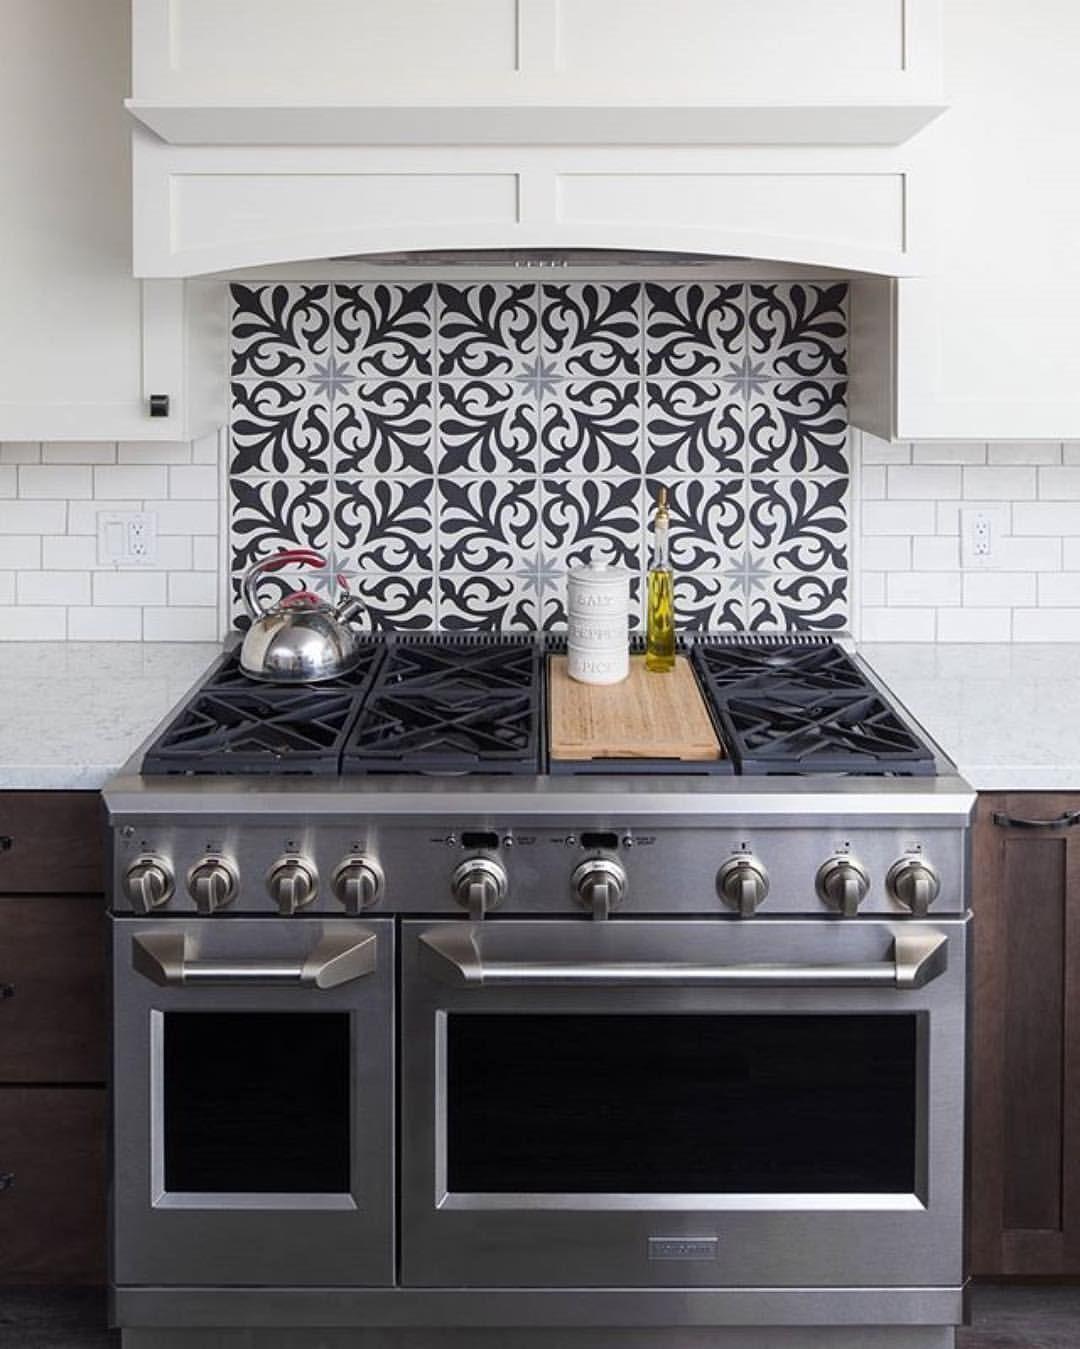 Design Tips For A Small Kitchen Farmhouse Kitchen Backsplash Stove Backsplash Kitchen Backsplash Designs